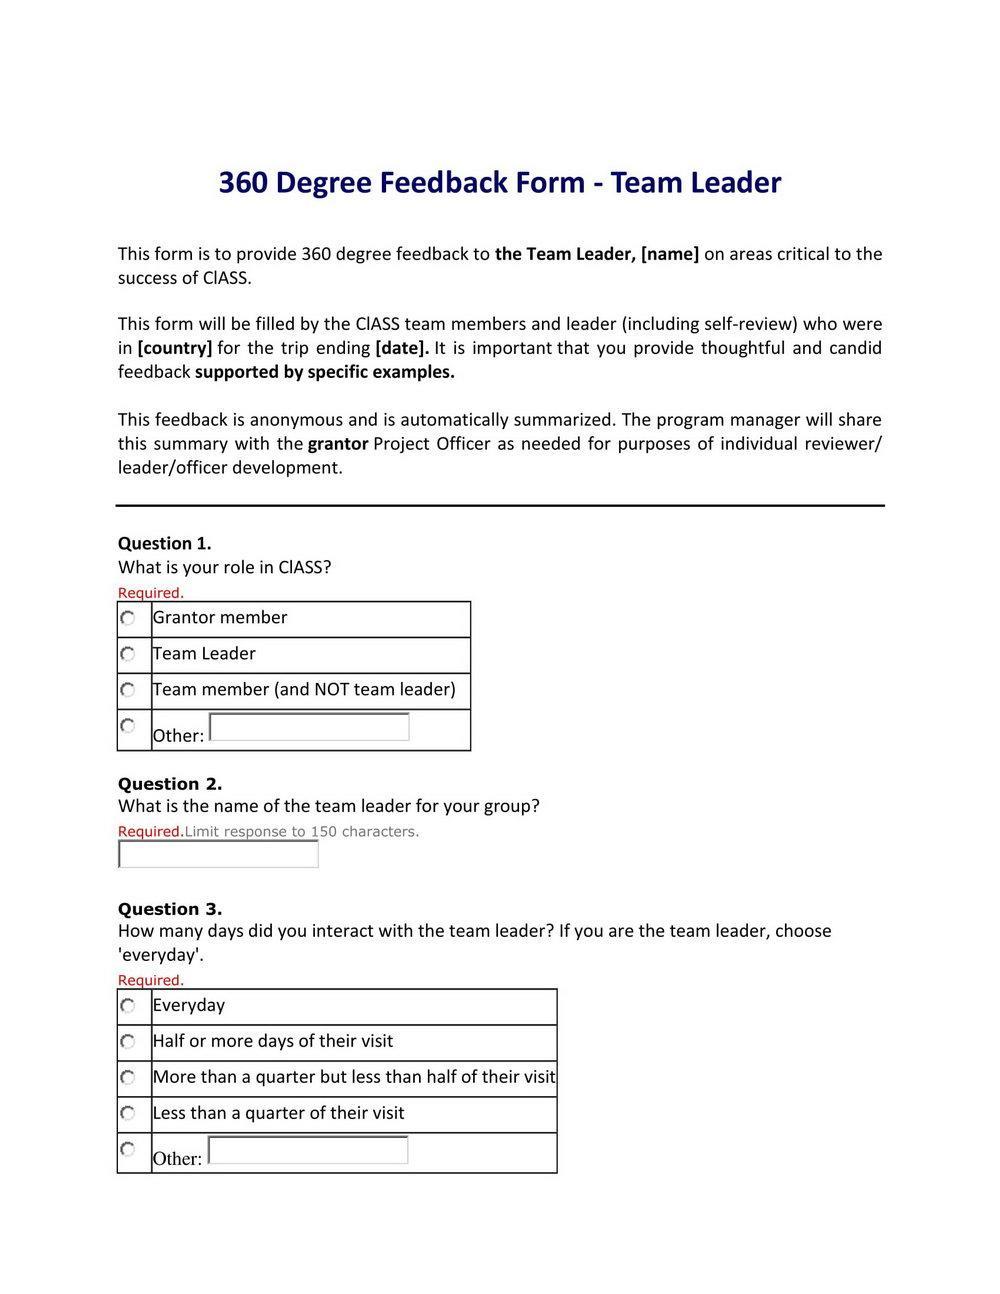 360 Feedback Template Pdf